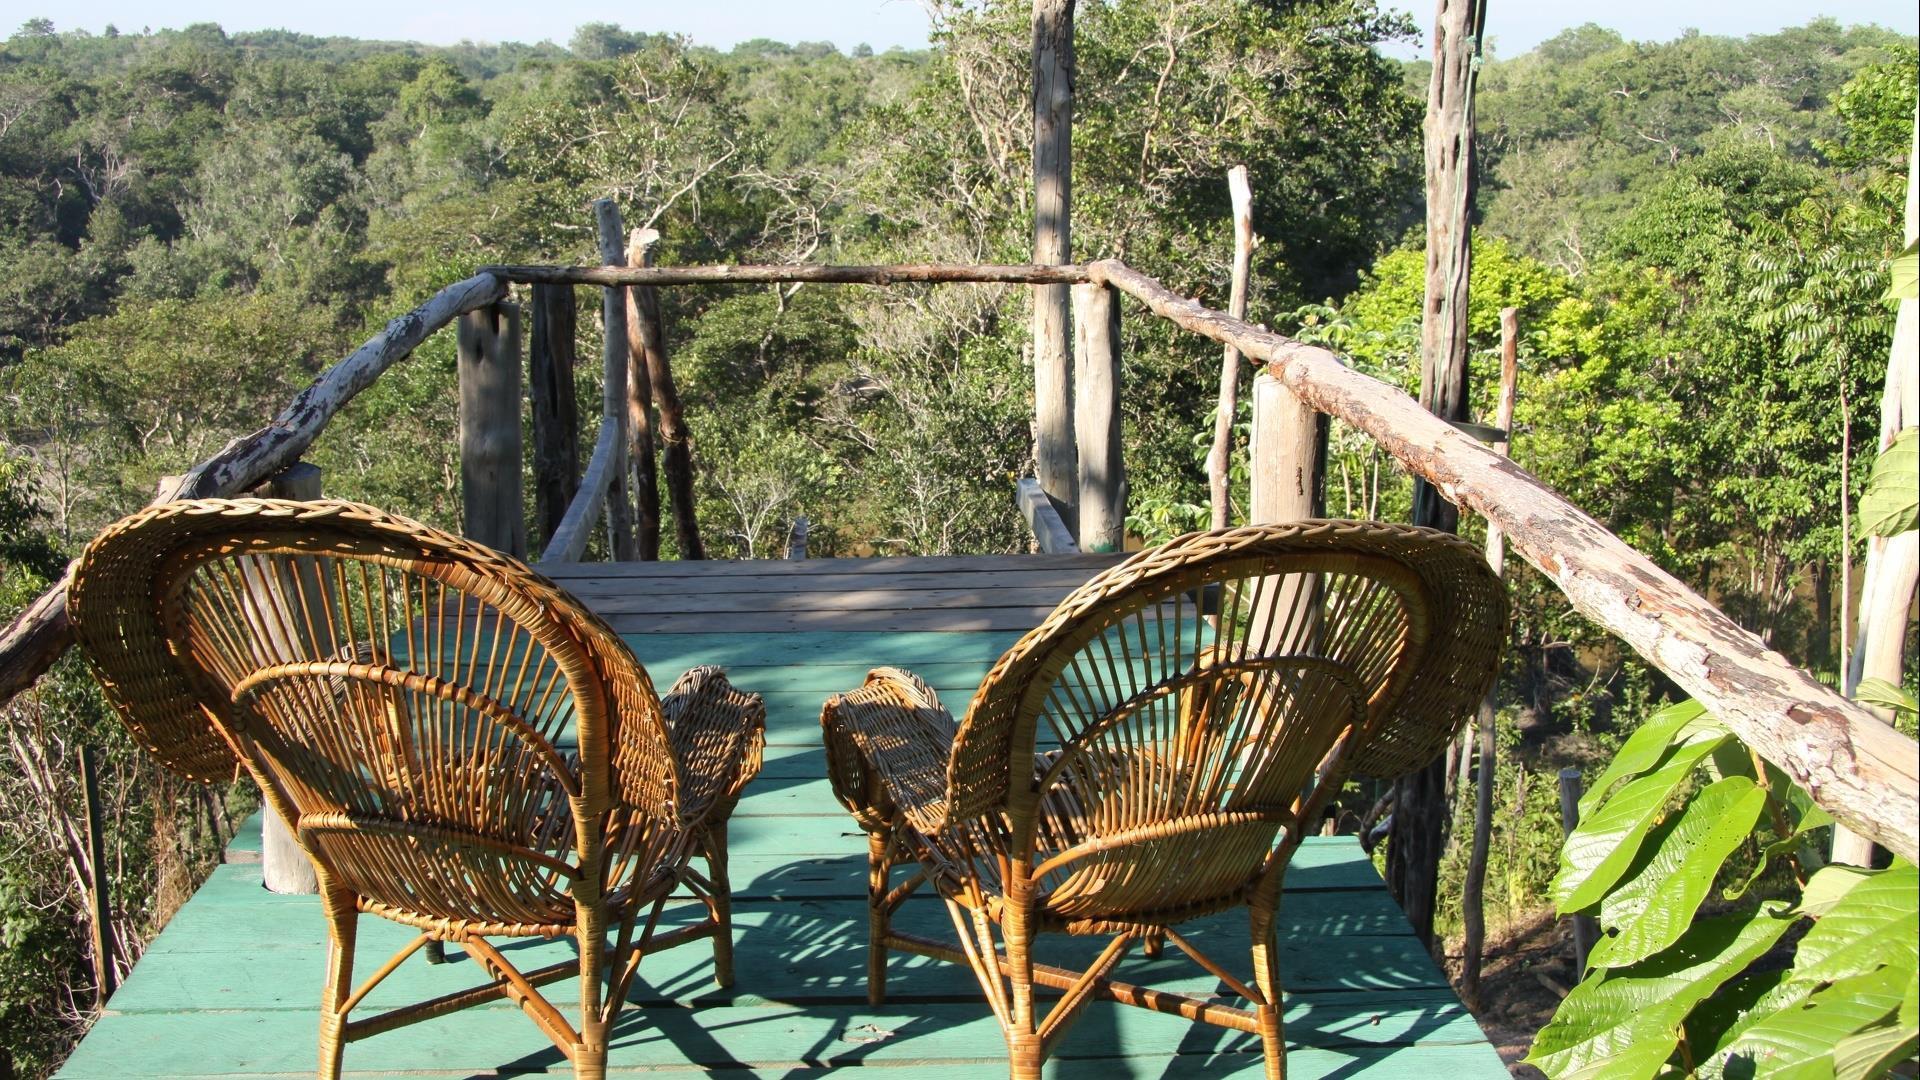 Brasilien Amazonas: 6 Tage Reisebaustein - Tupana Lodge Japiim Paket